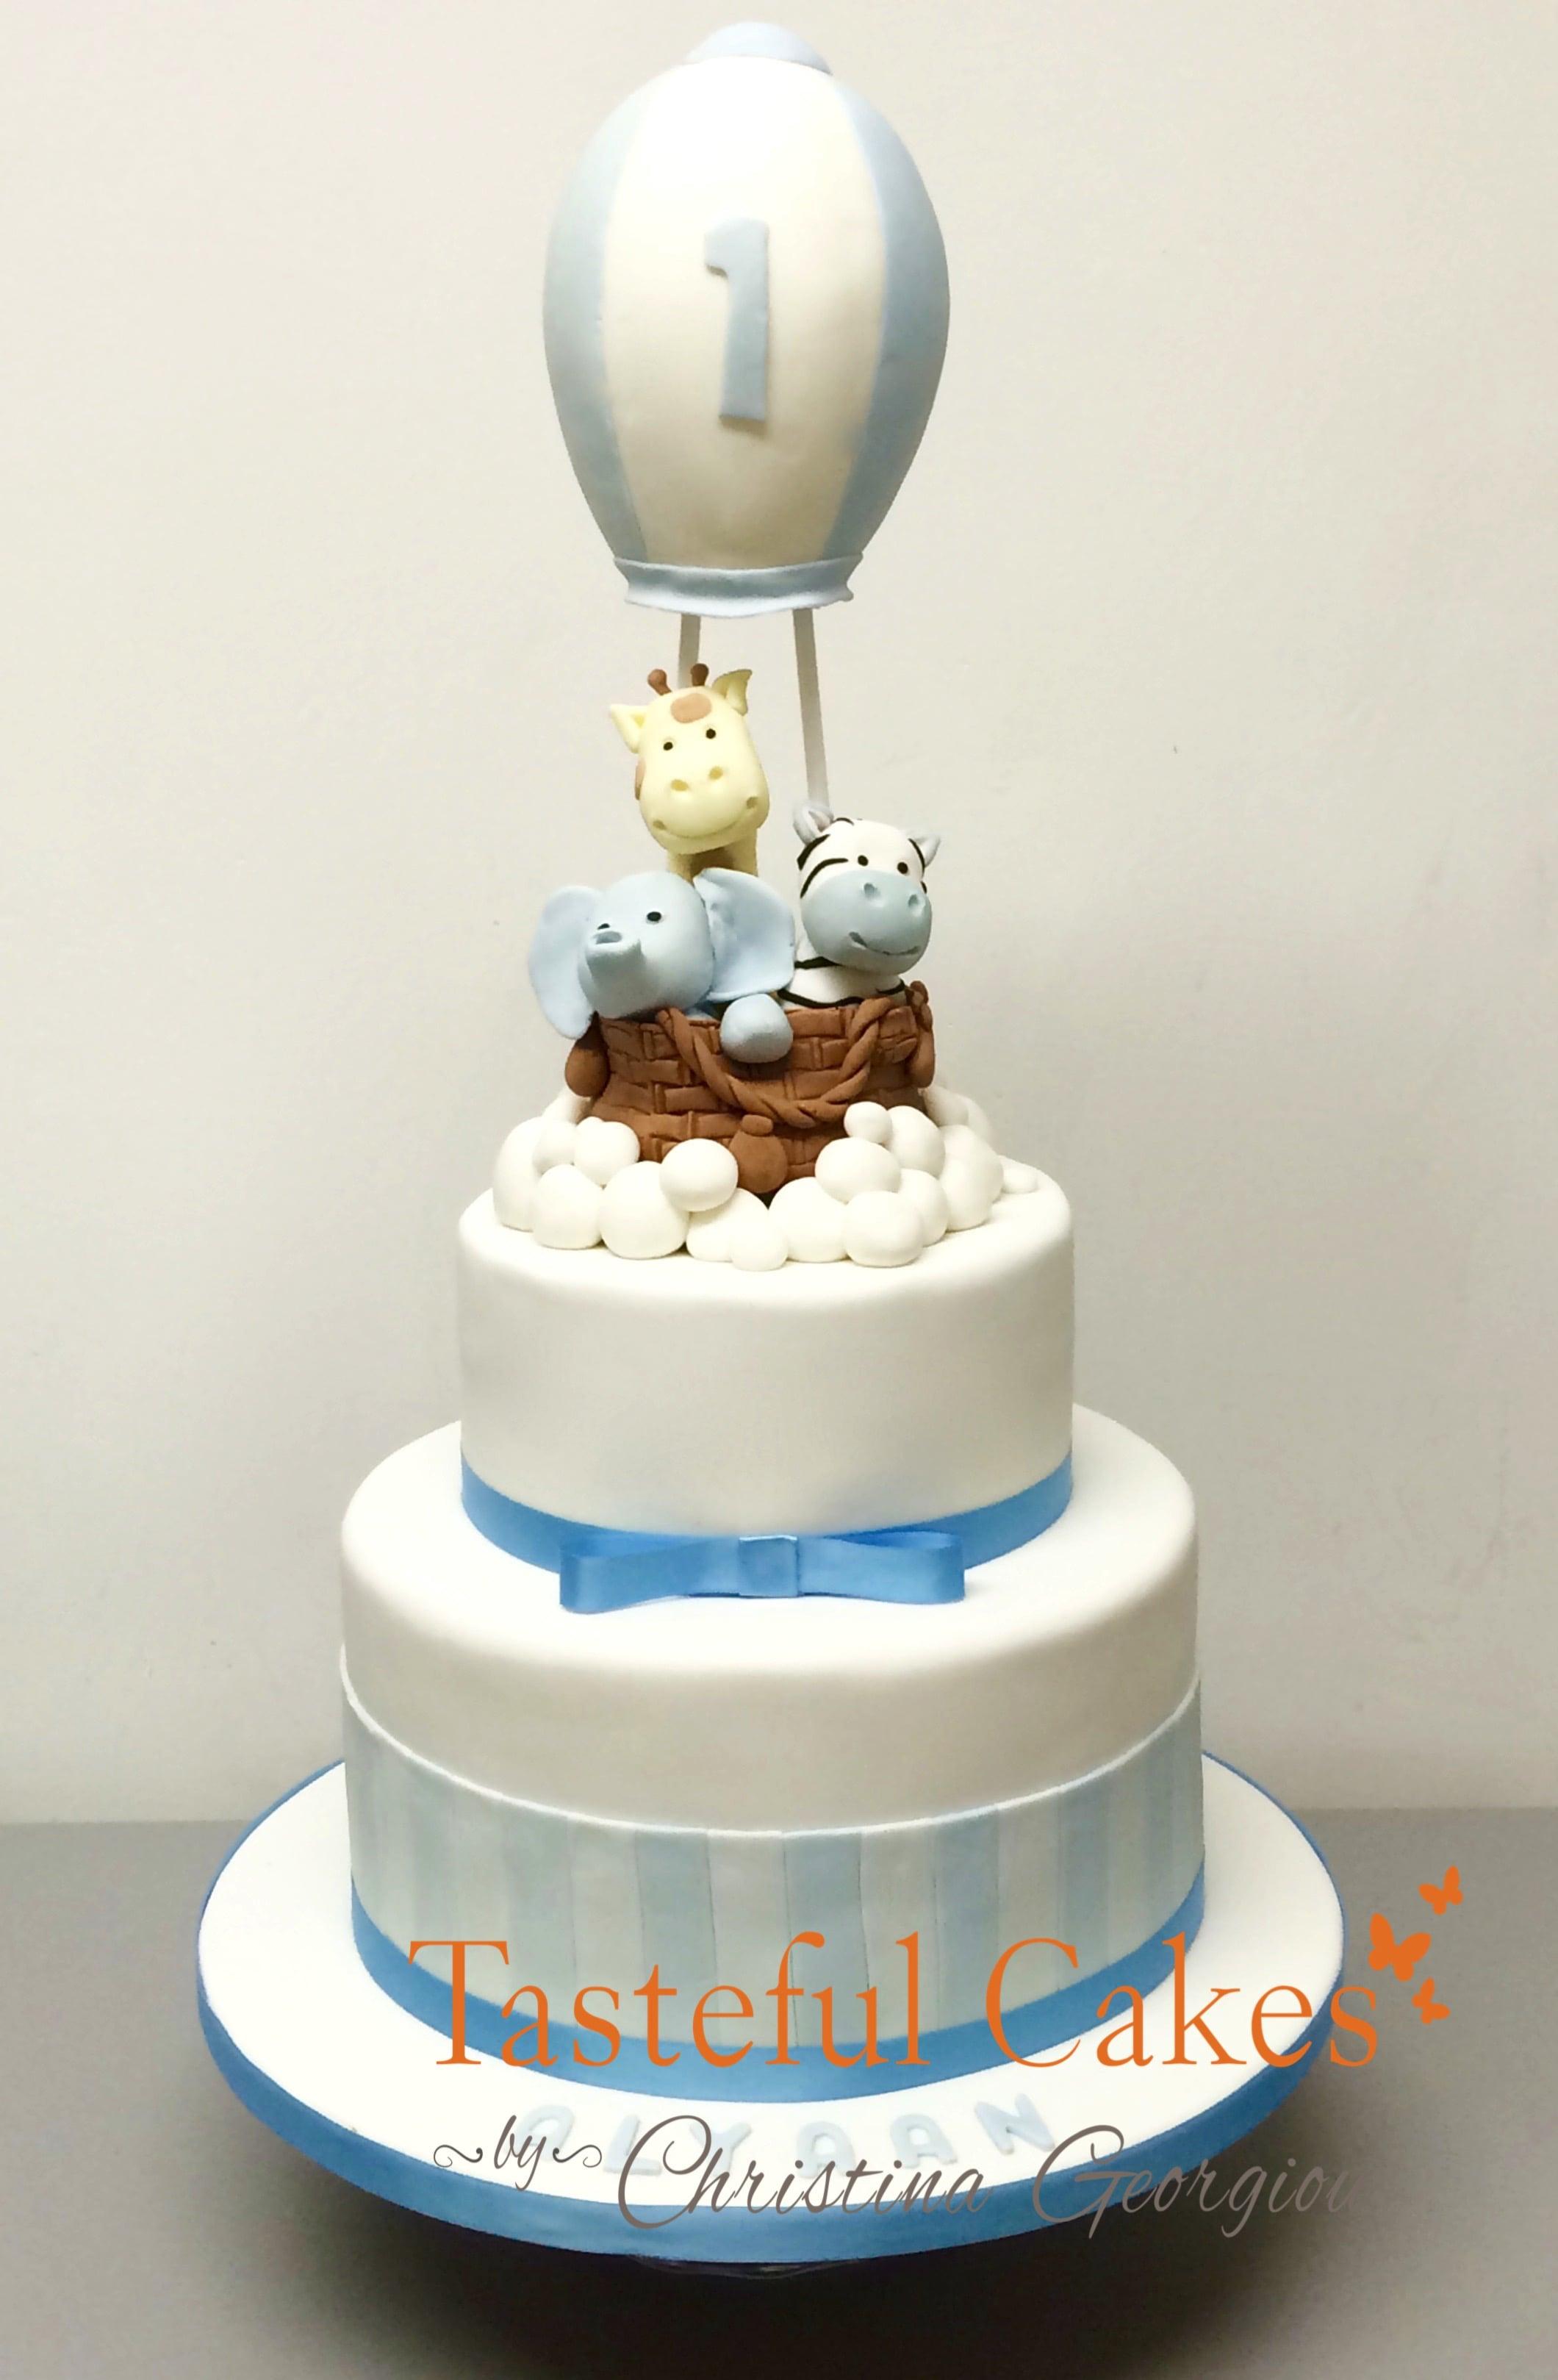 Hot air ballon christening cake 1 bristol bakery birthday cakes 6 on bristol bakery birthday cakes